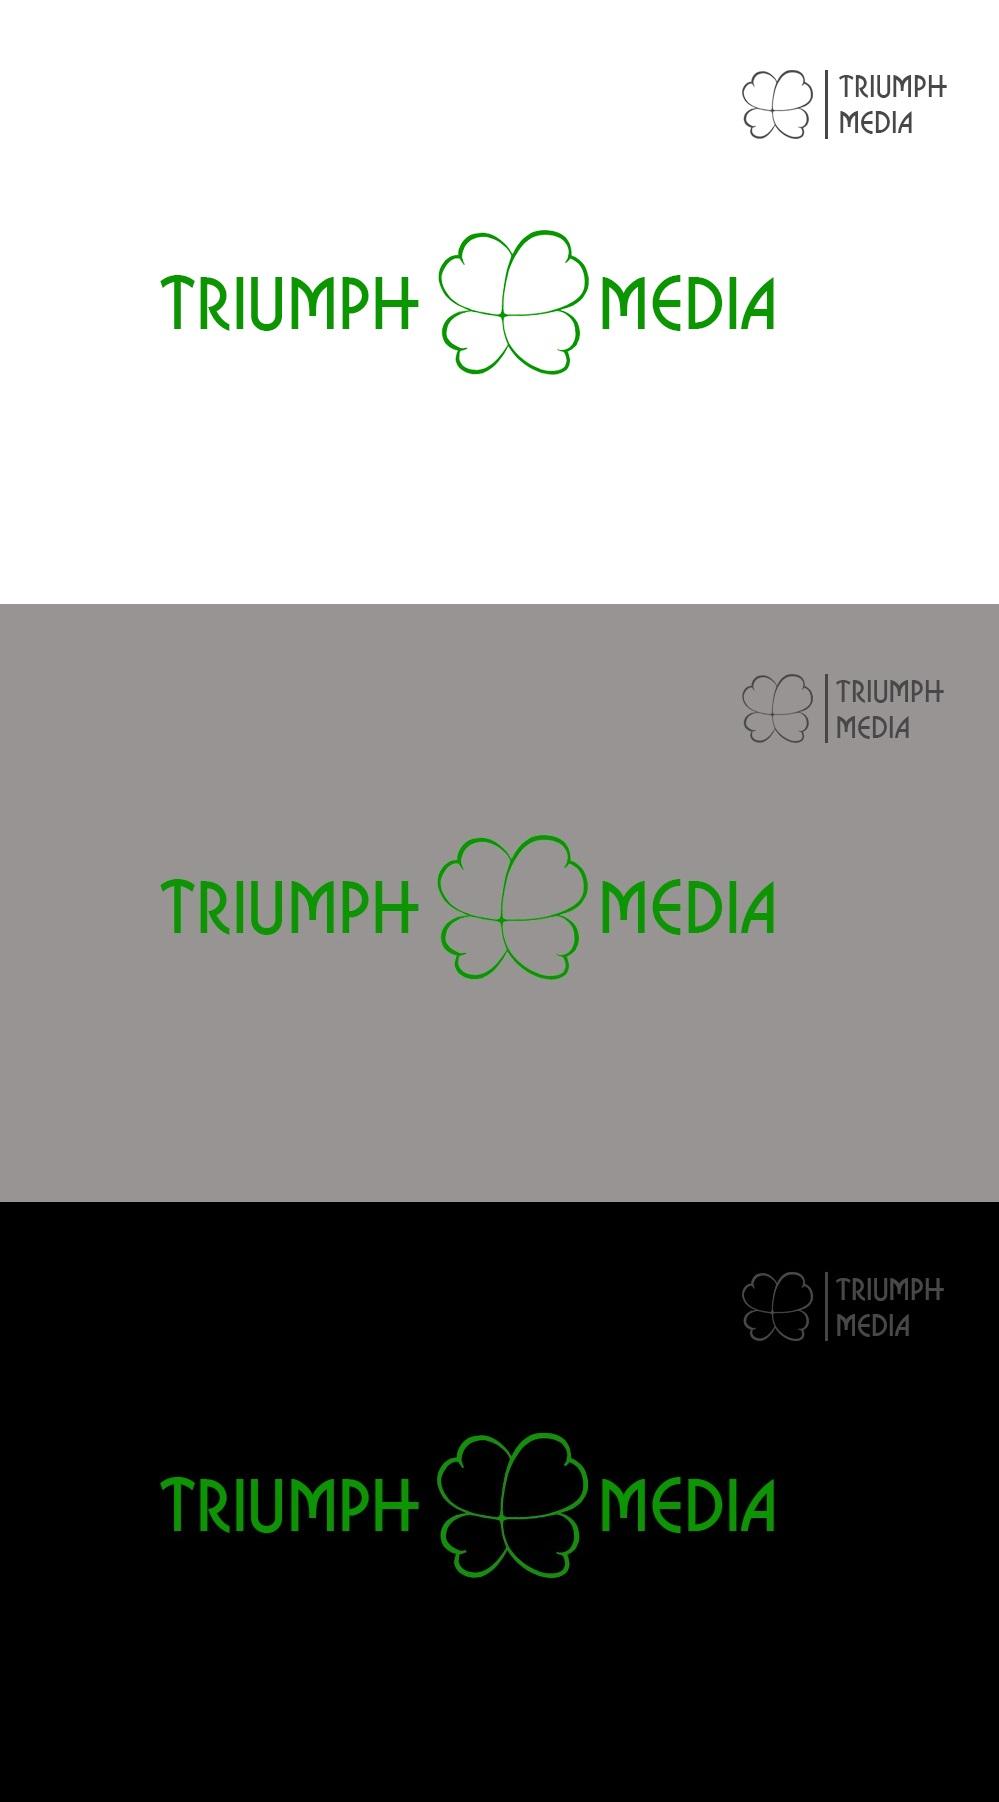 Разработка логотипа  TRIUMPH MEDIA с изображением клевера фото f_507318c5c1549.jpg